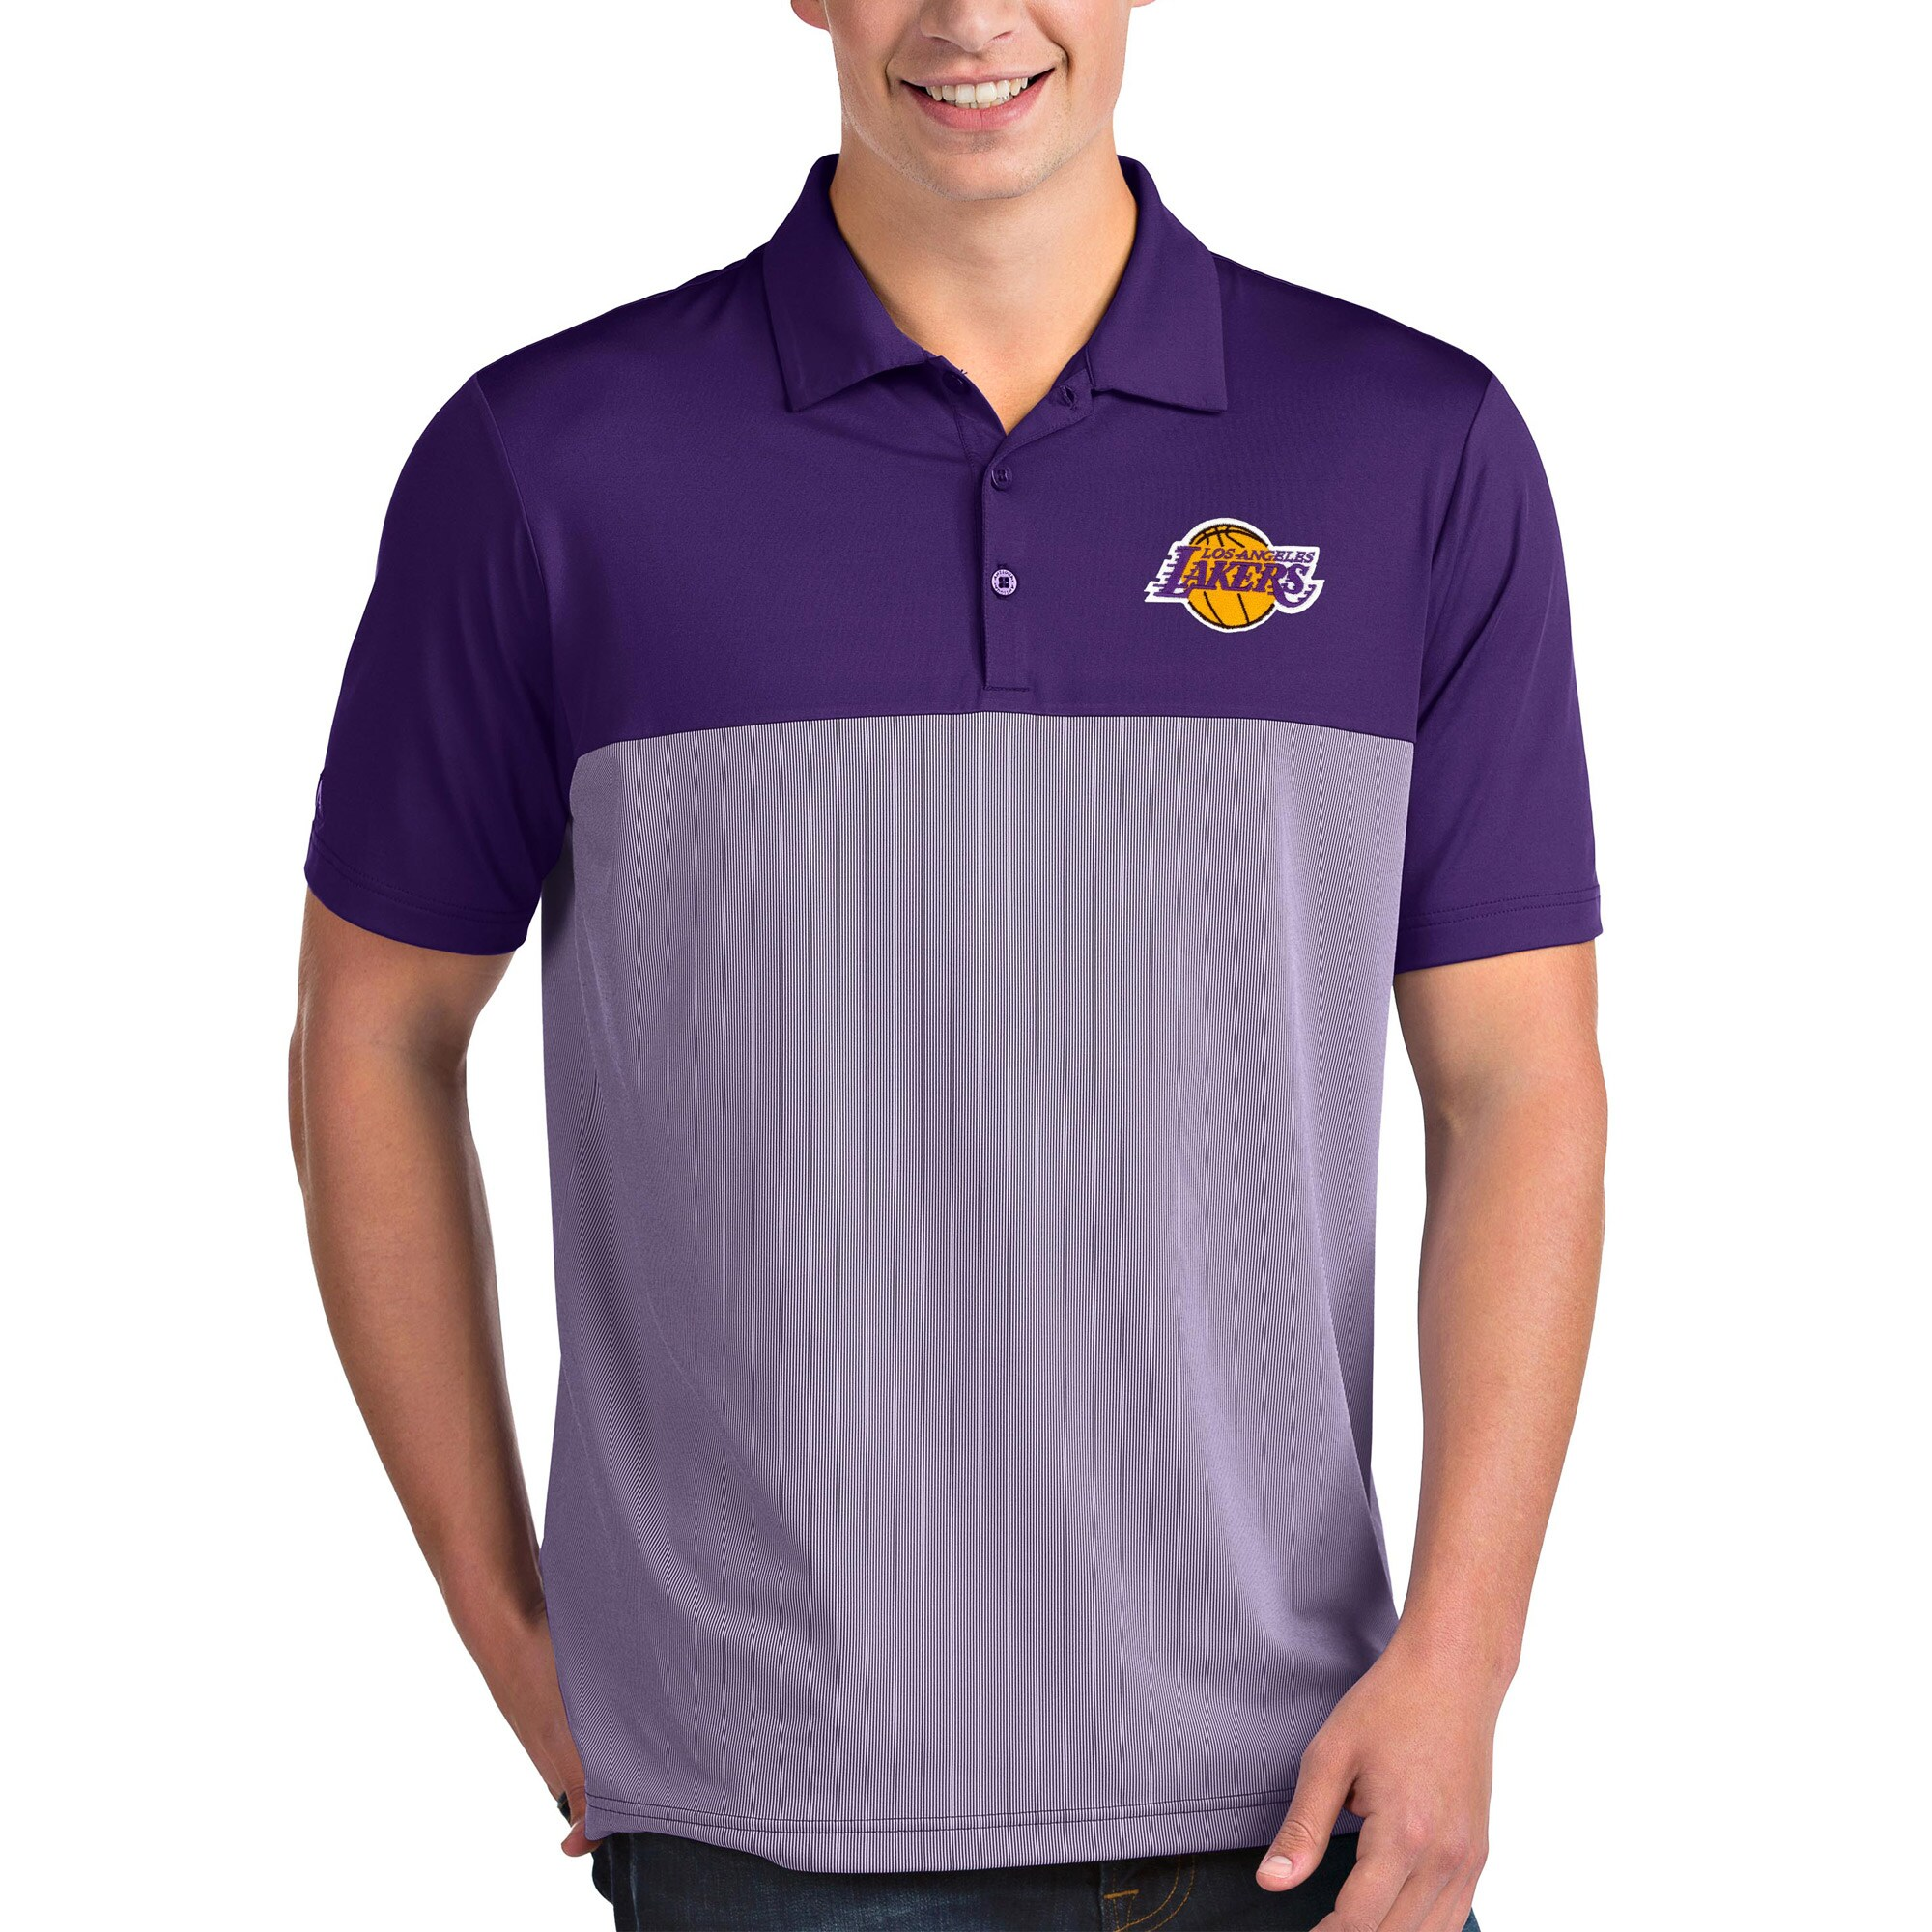 Los Angeles Lakers Antigua Venture Polo - Purple/White